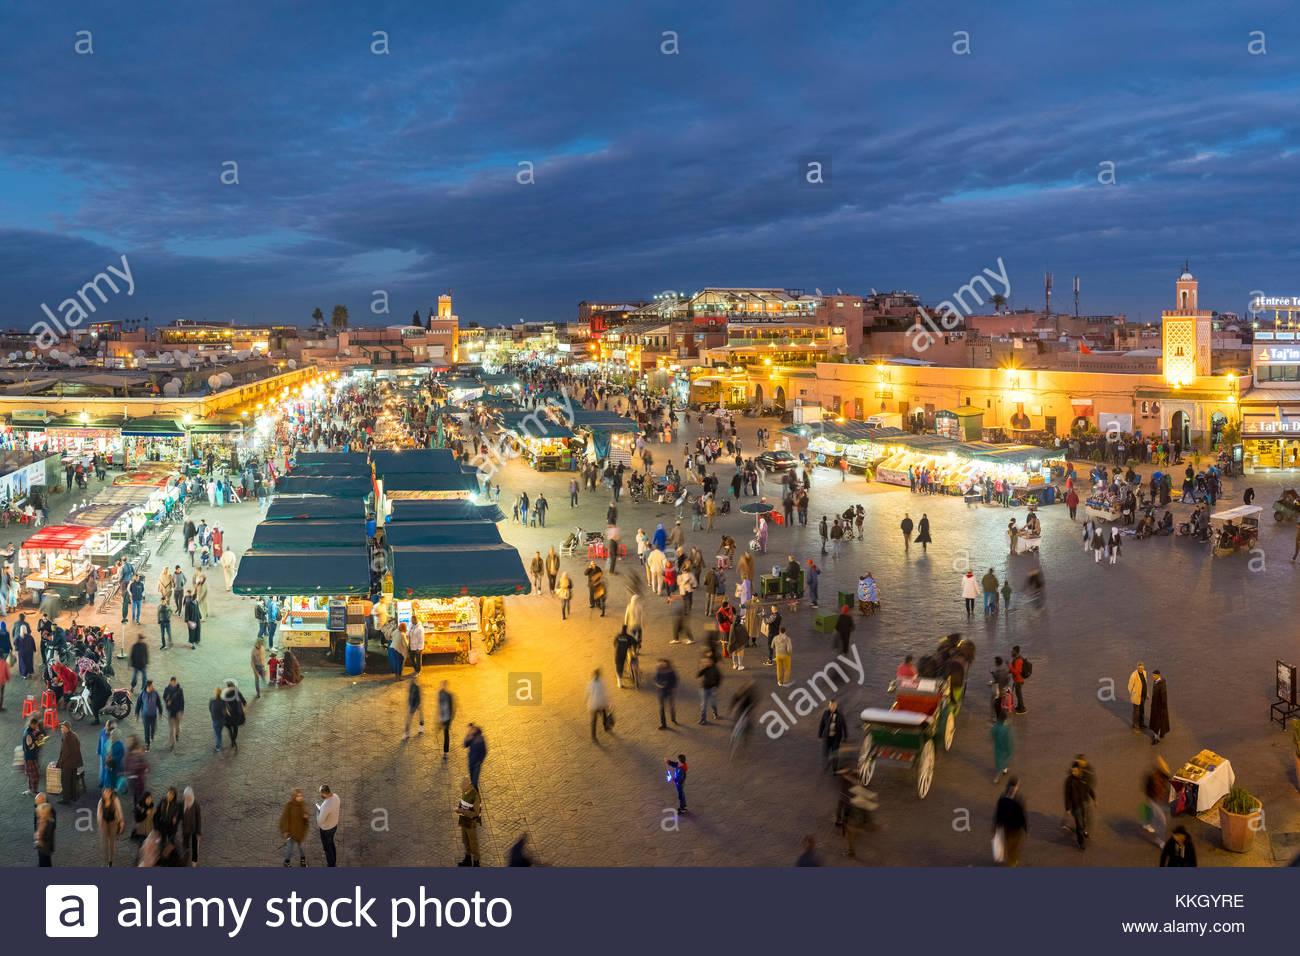 Il Marocco, Marrakech-Safi (Marrakesh-Tensift-El Haouz) regione, Marrakech. Jamaa El-Fná square al crepuscolo. Foto Stock